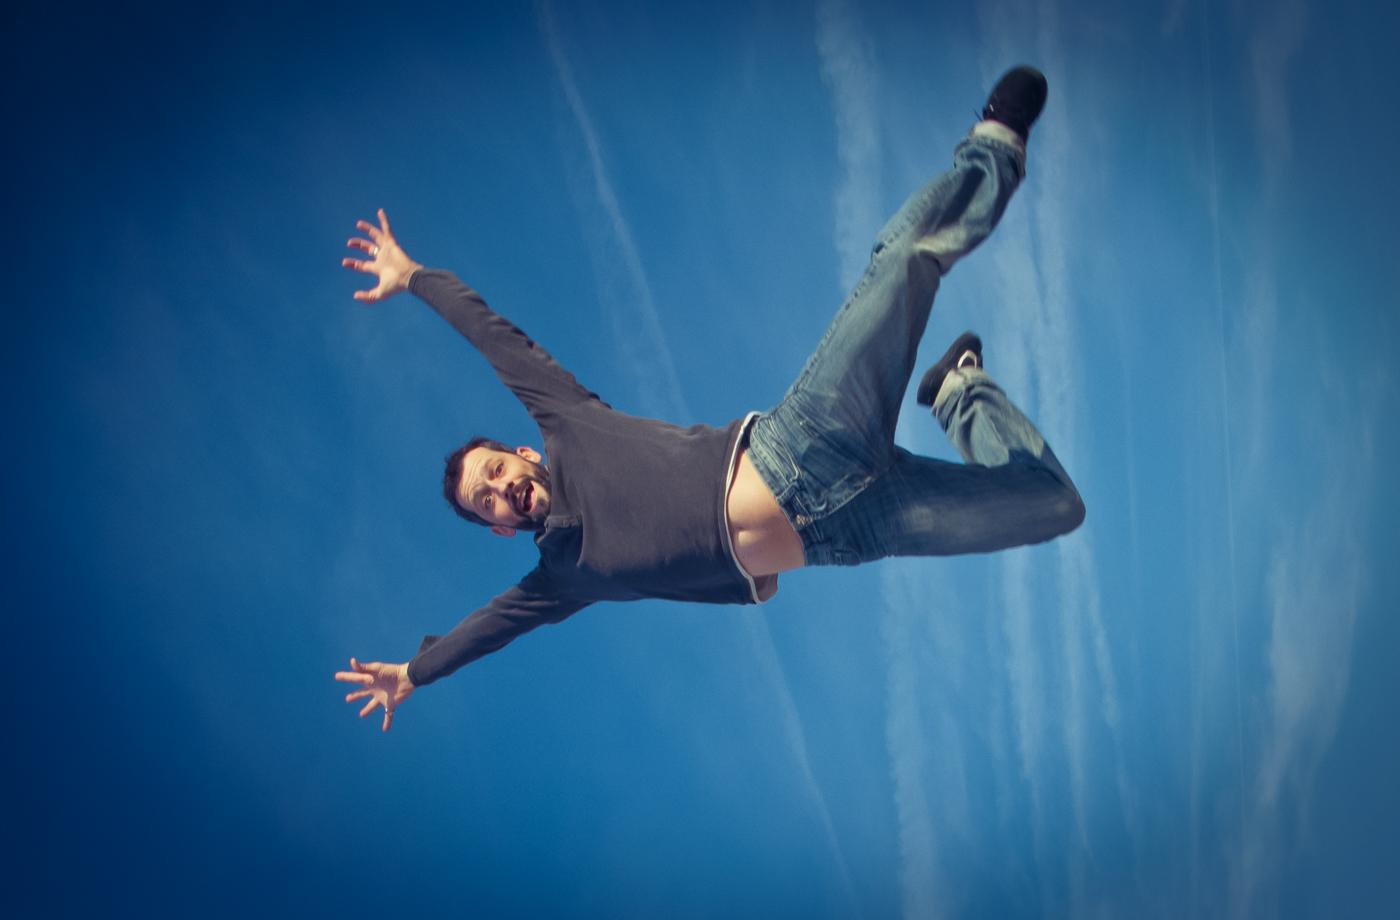 libre chute